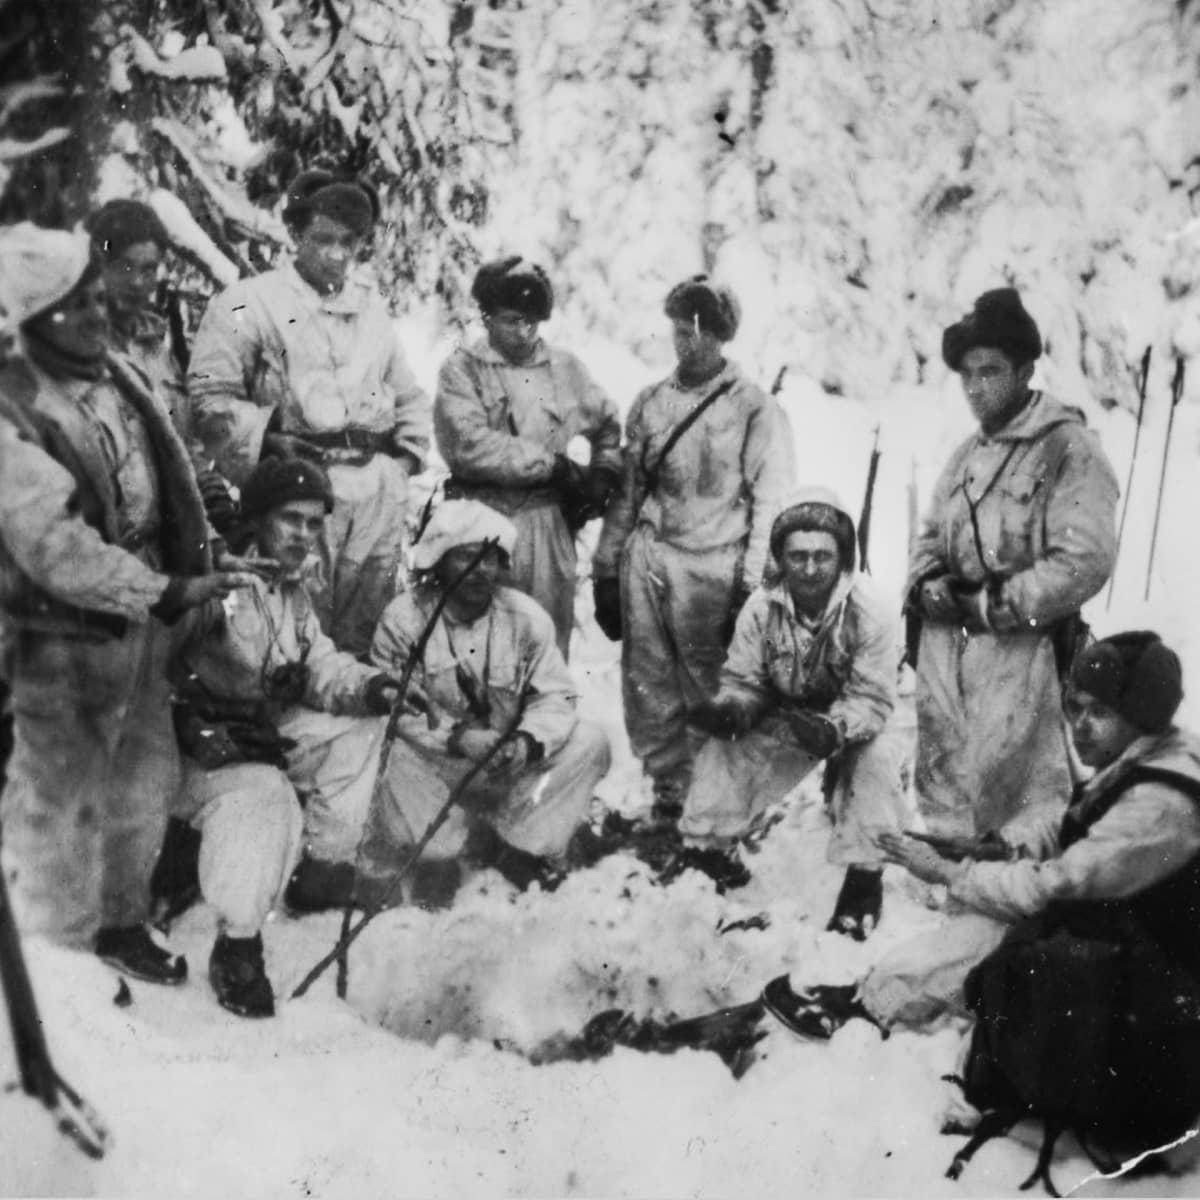 Suomalaisia sotilaita lumihangessa.